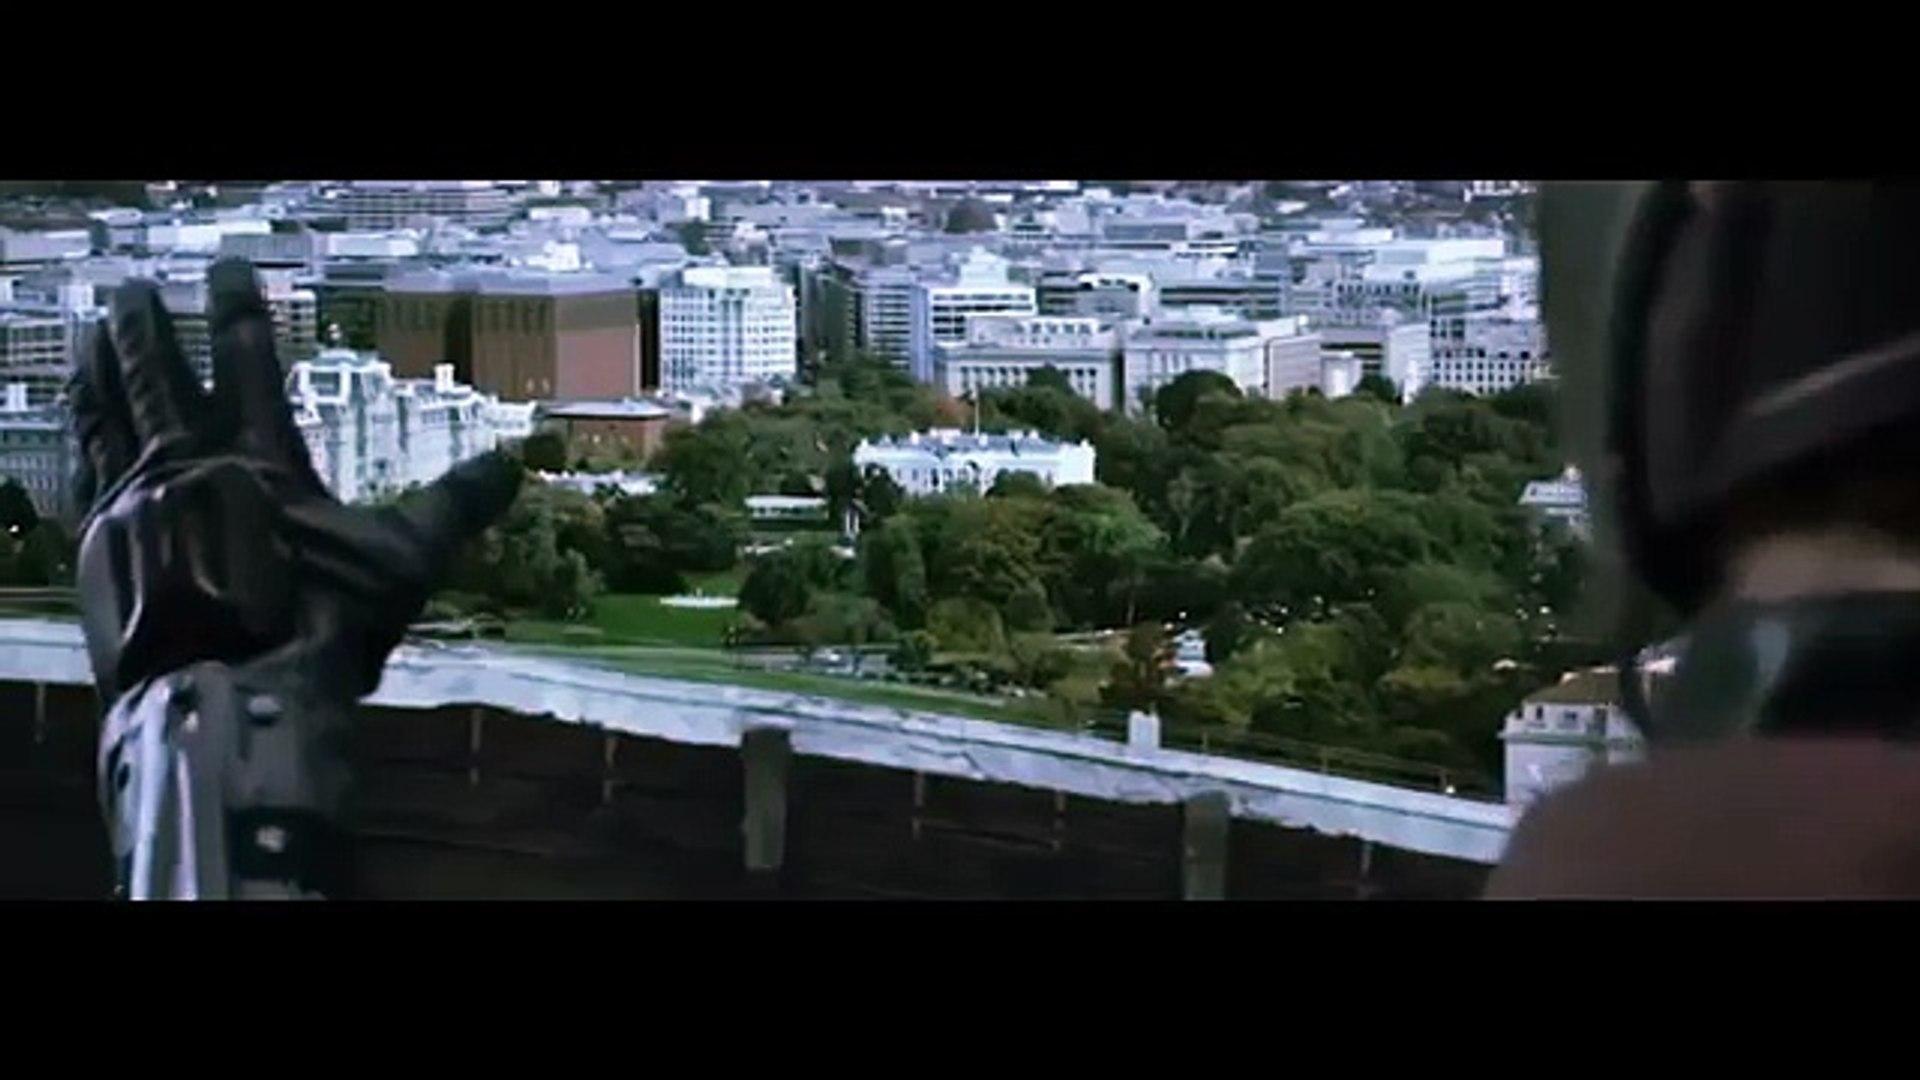 Krrish 4 Official Trailer HD 2019 - Hrithik Roshan